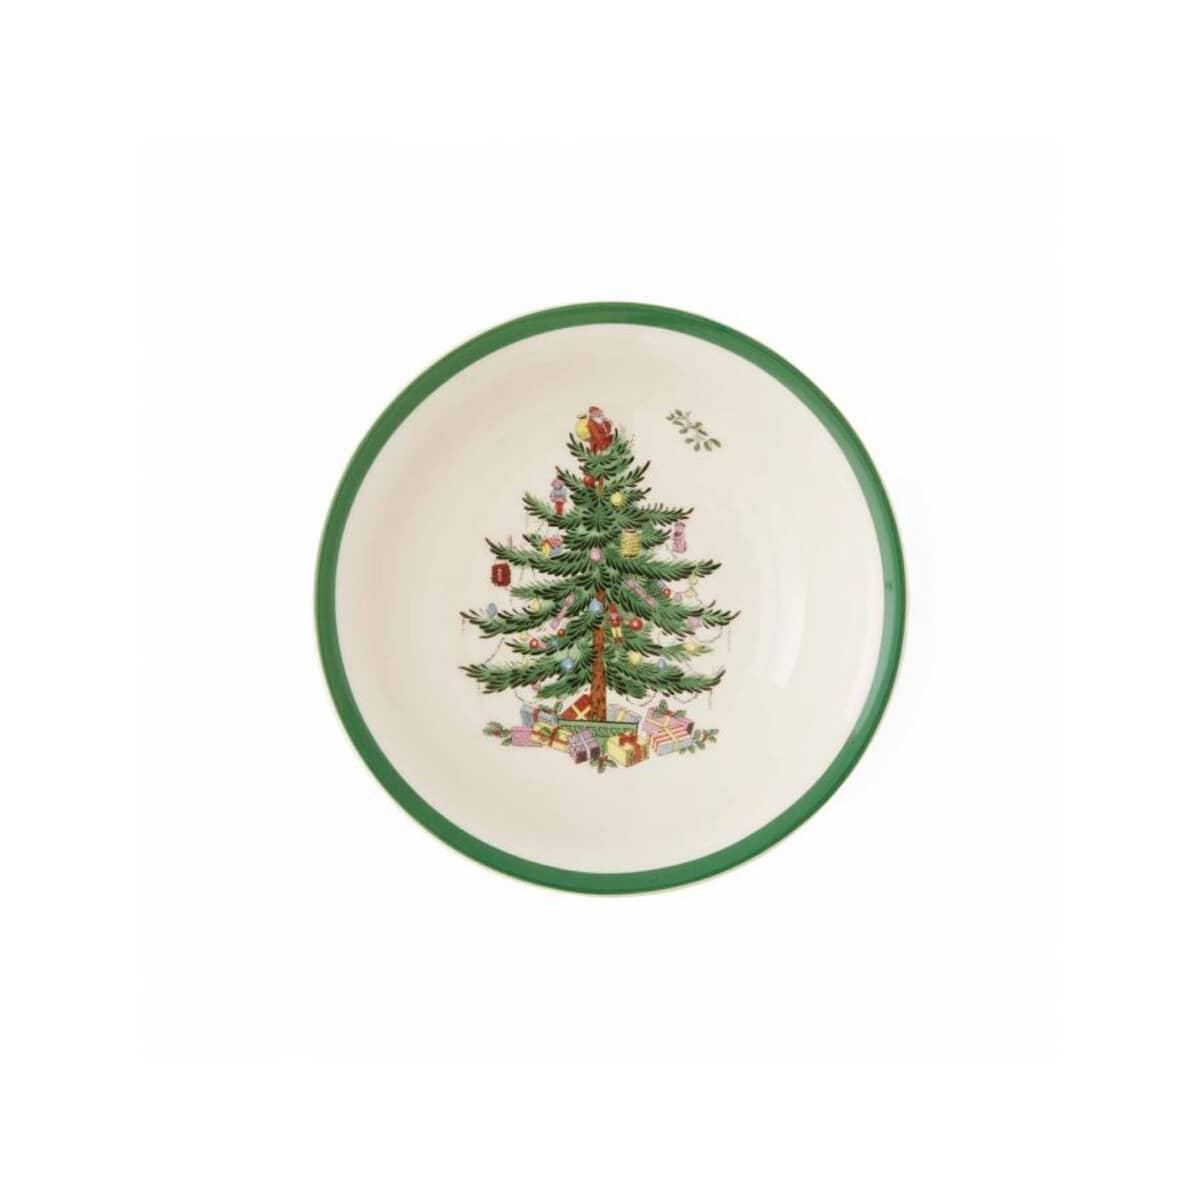 Spode Christmas Plates.Spode Christmas Tree Soup Cereal Bowl 20 5cm